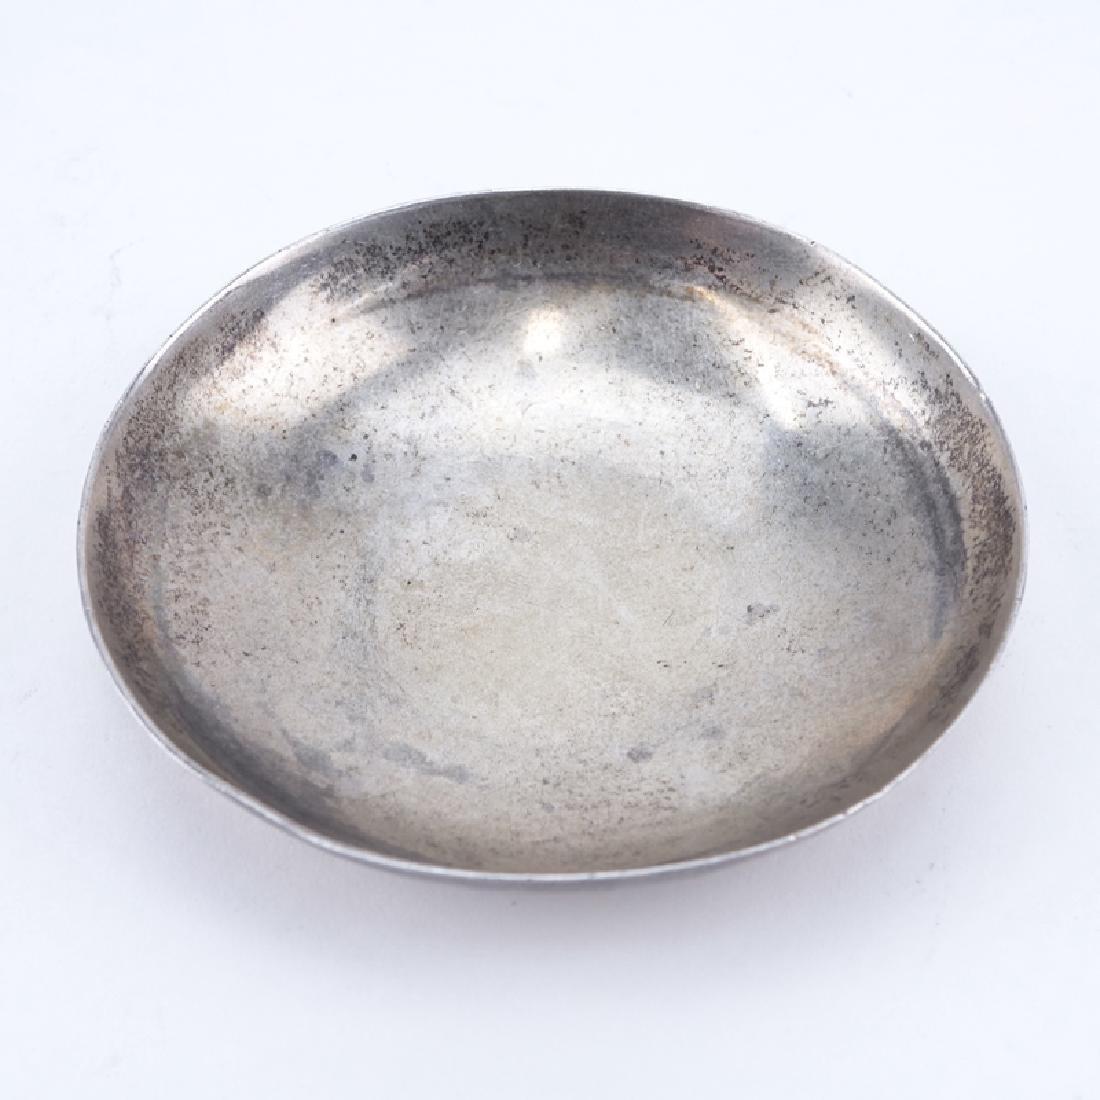 Vintage William Spratling, Mexico Sterling Silver Nut